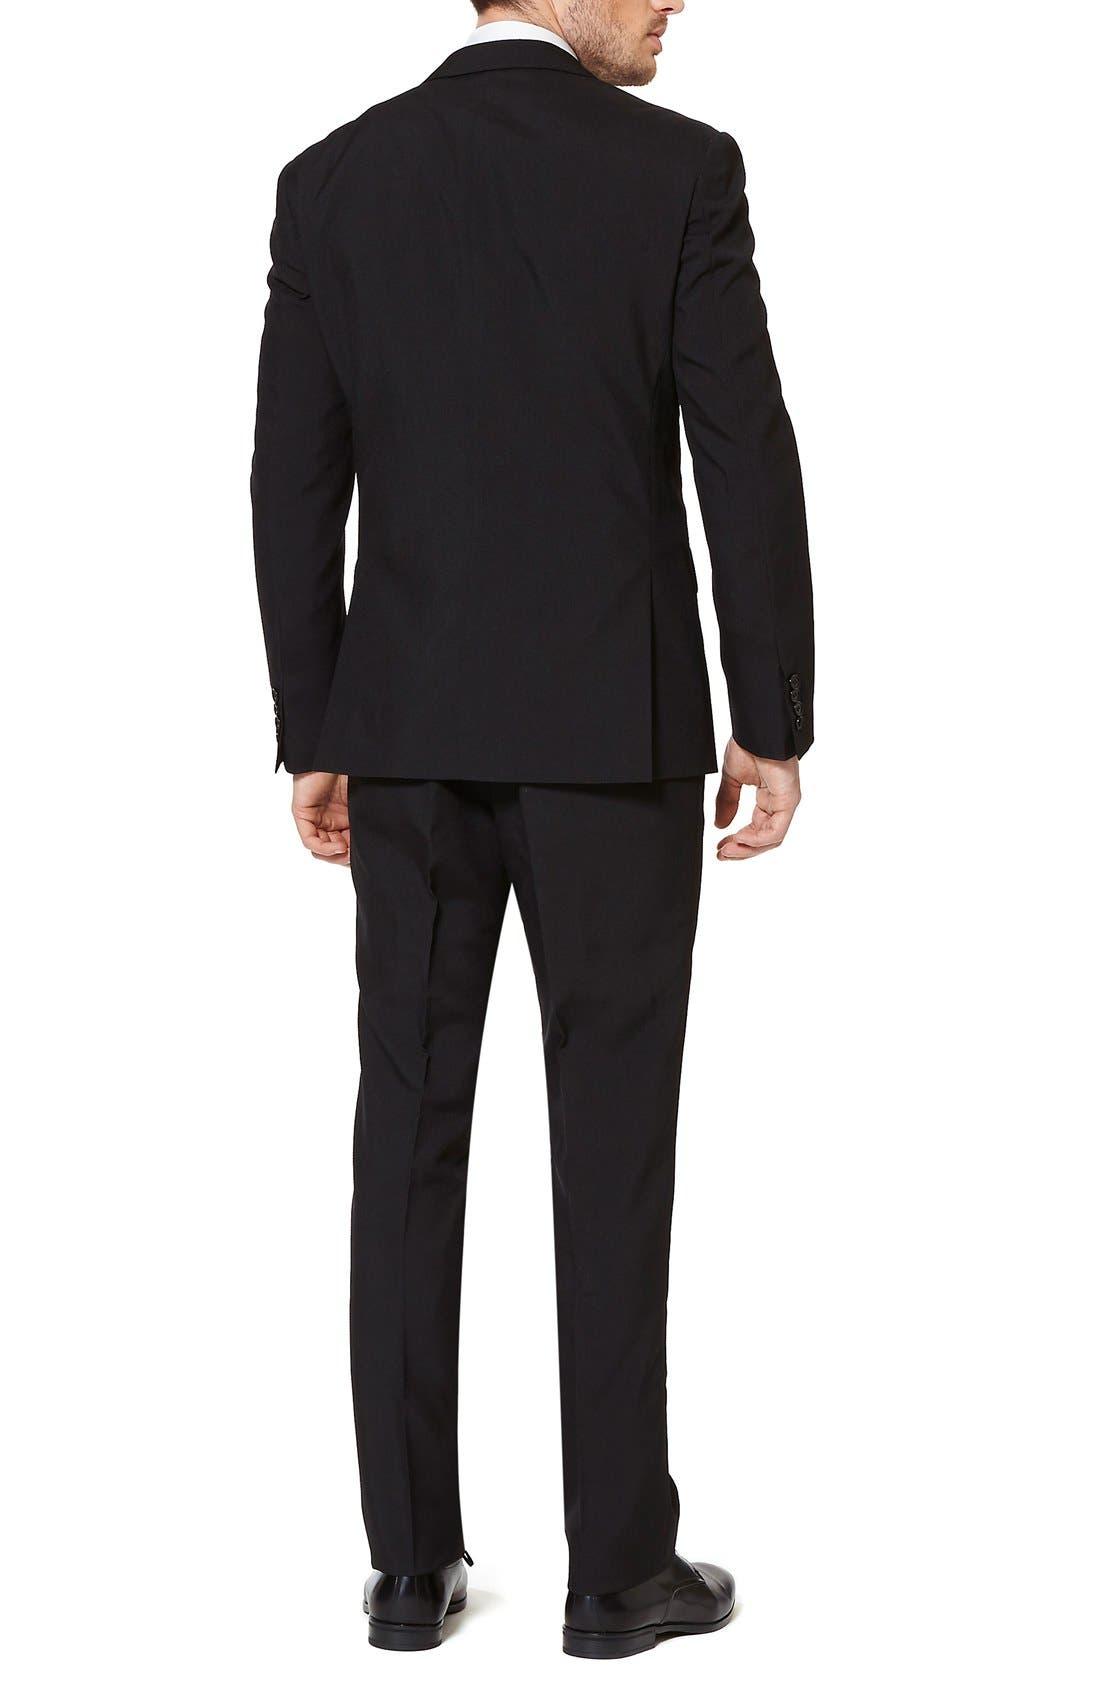 'Black Knight' Trim Fit Two-Piece Suit with Tie,                             Alternate thumbnail 2, color,                             001